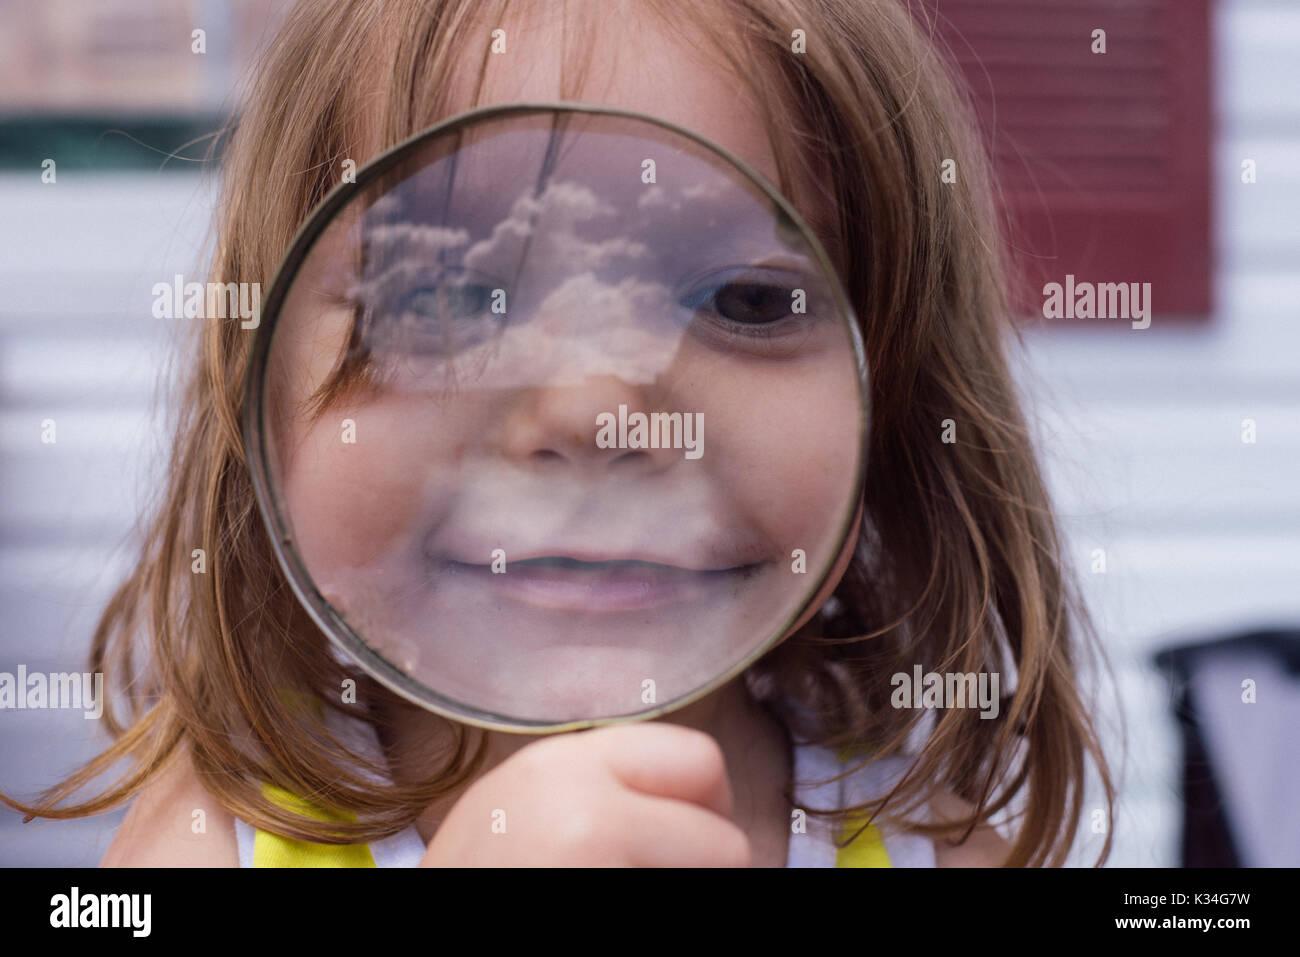 A young girl looks through a circular magnifying glass. - Stock Image